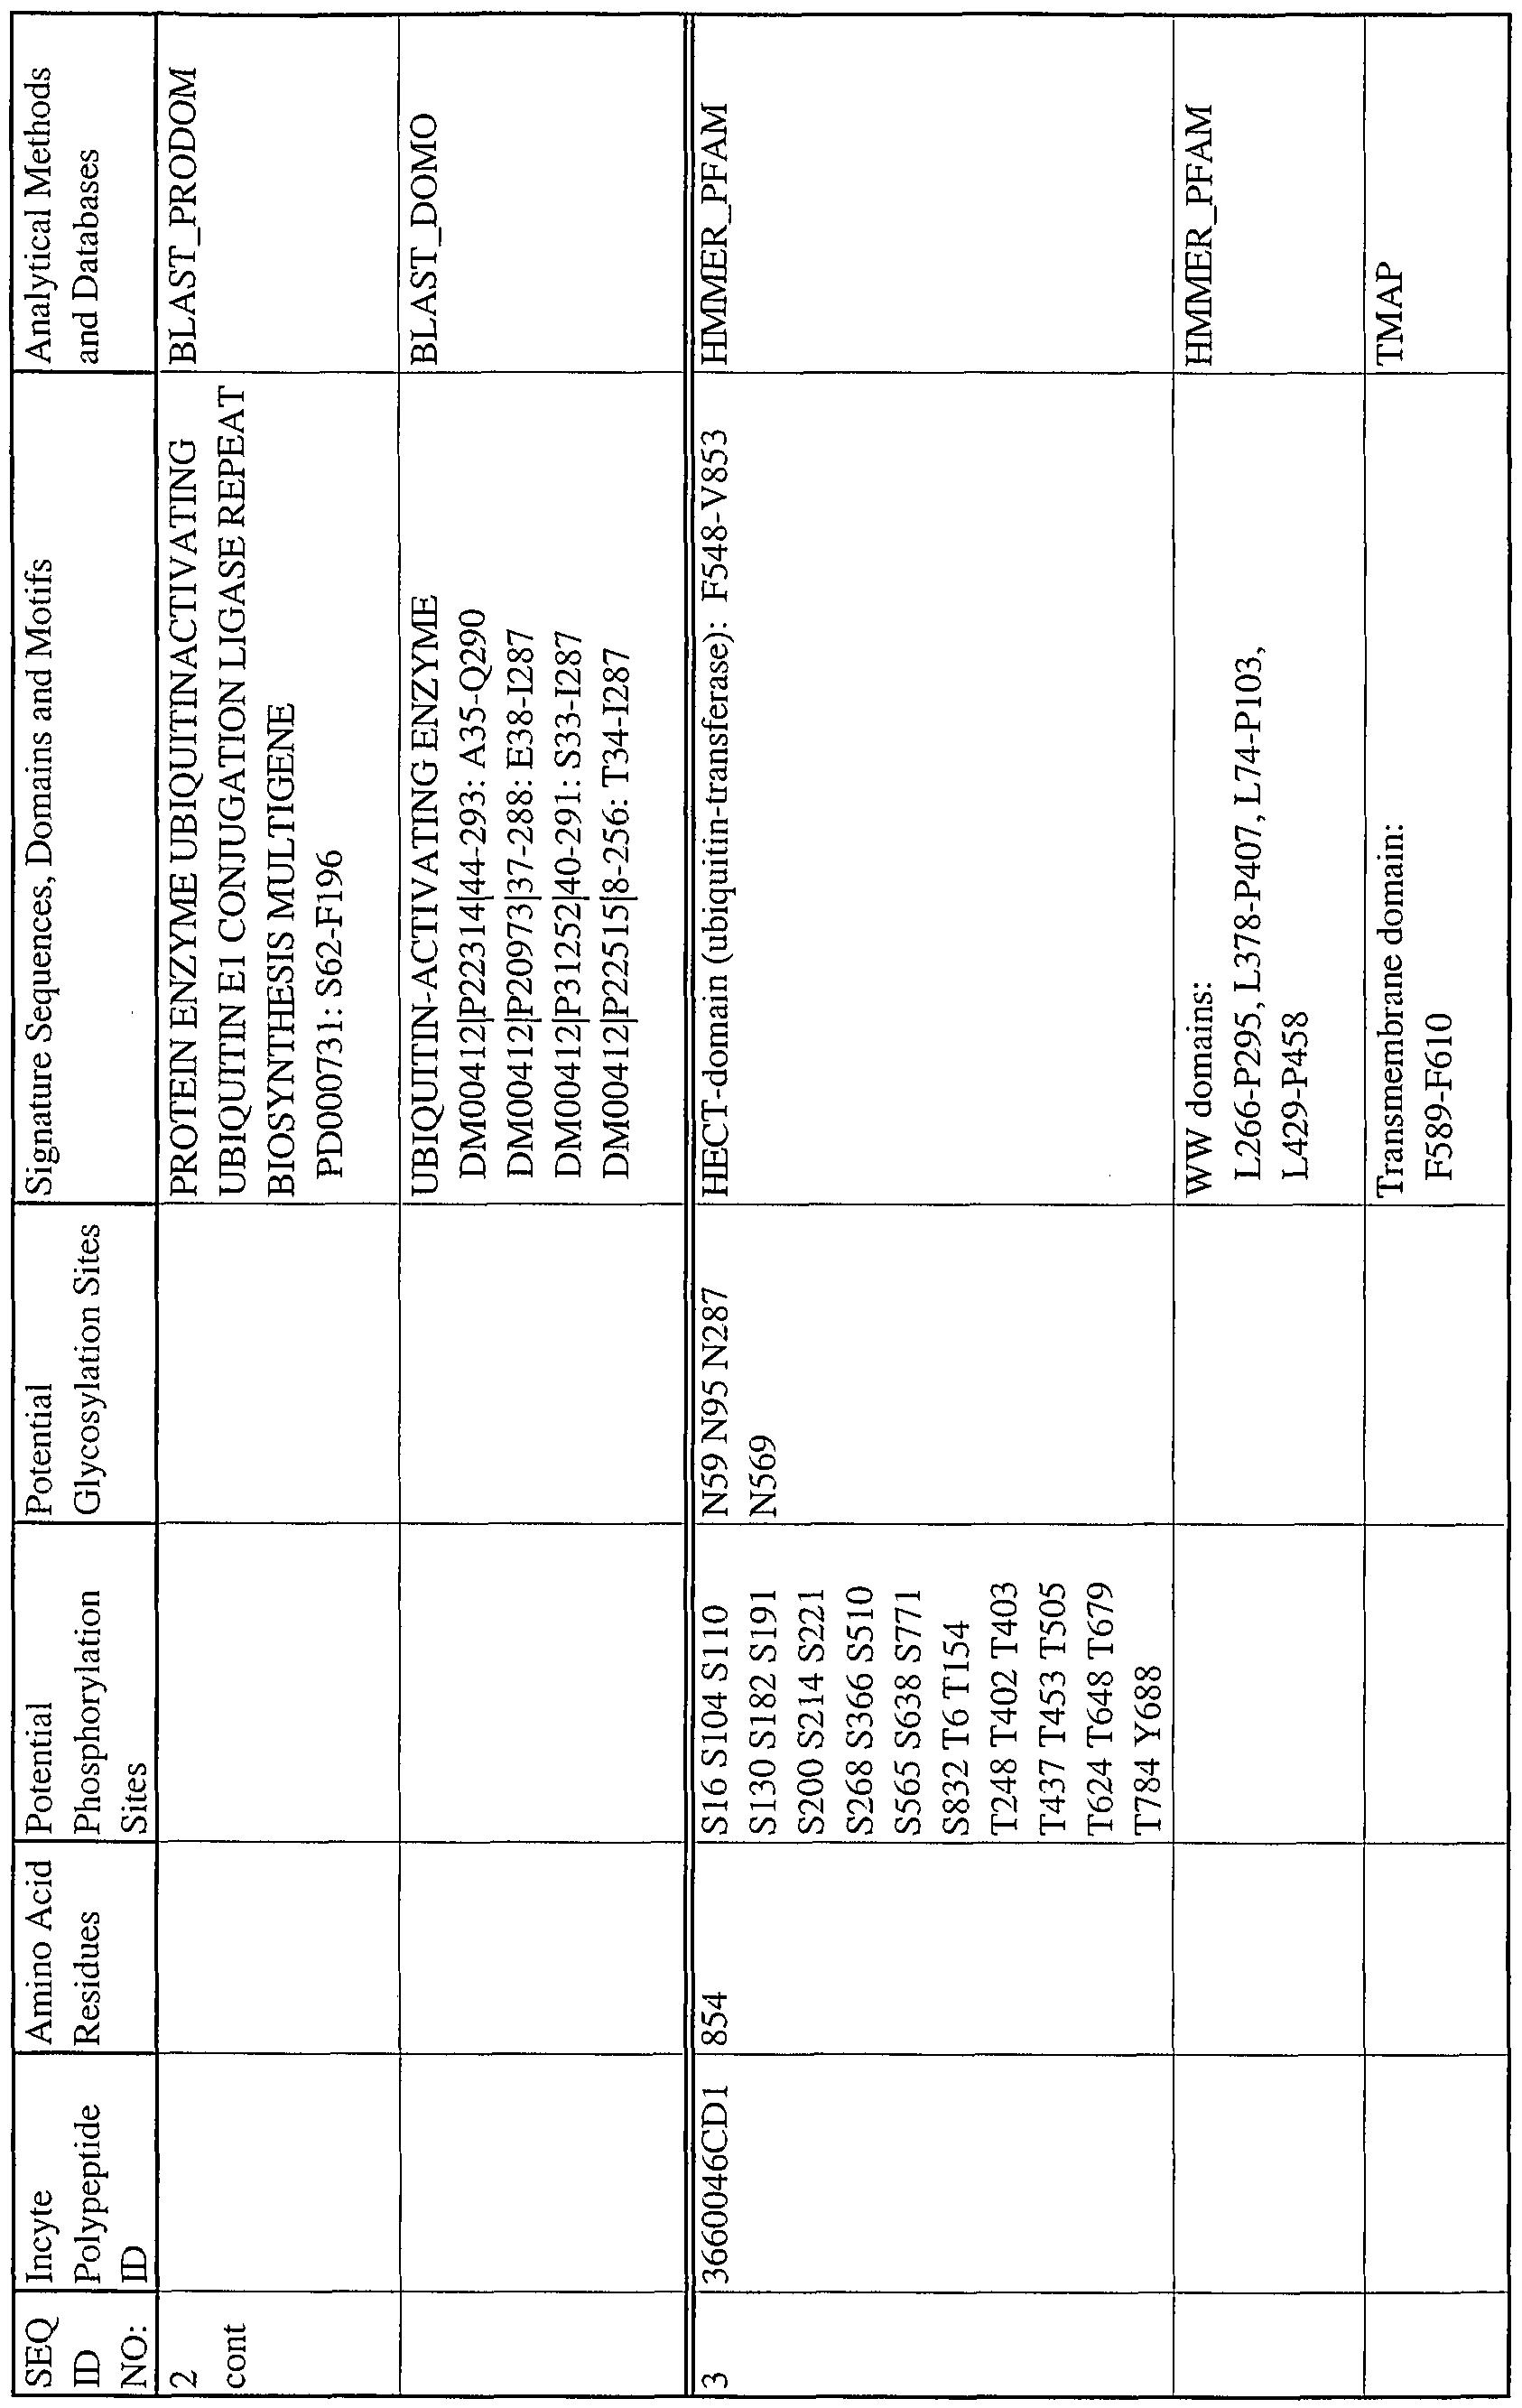 ACARD V853 WINDOWS XP DRIVER